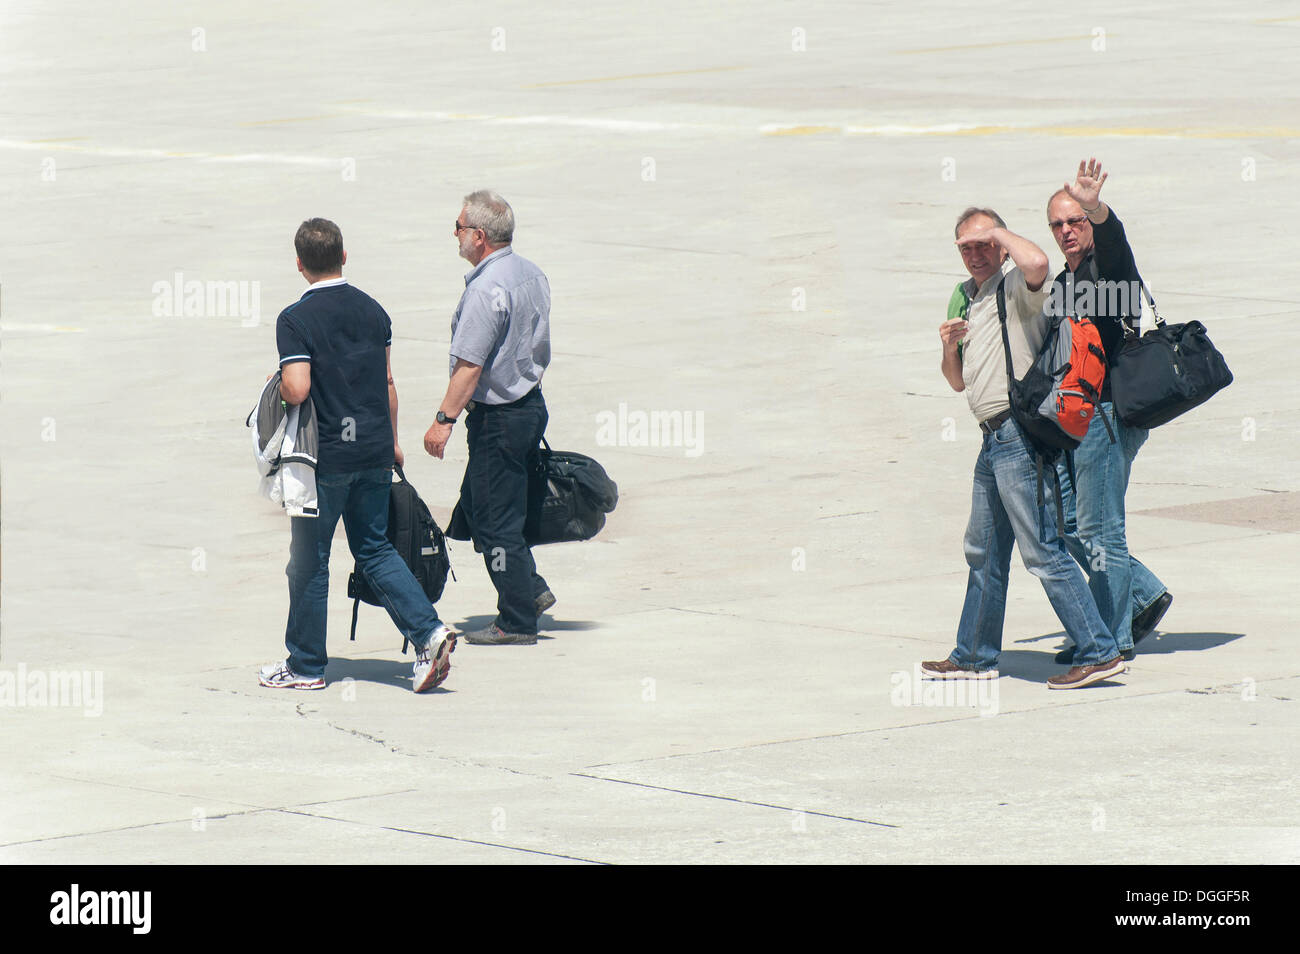 Four people walking across the tarmac to their plane, Split, Croatia, Europe - Stock Image